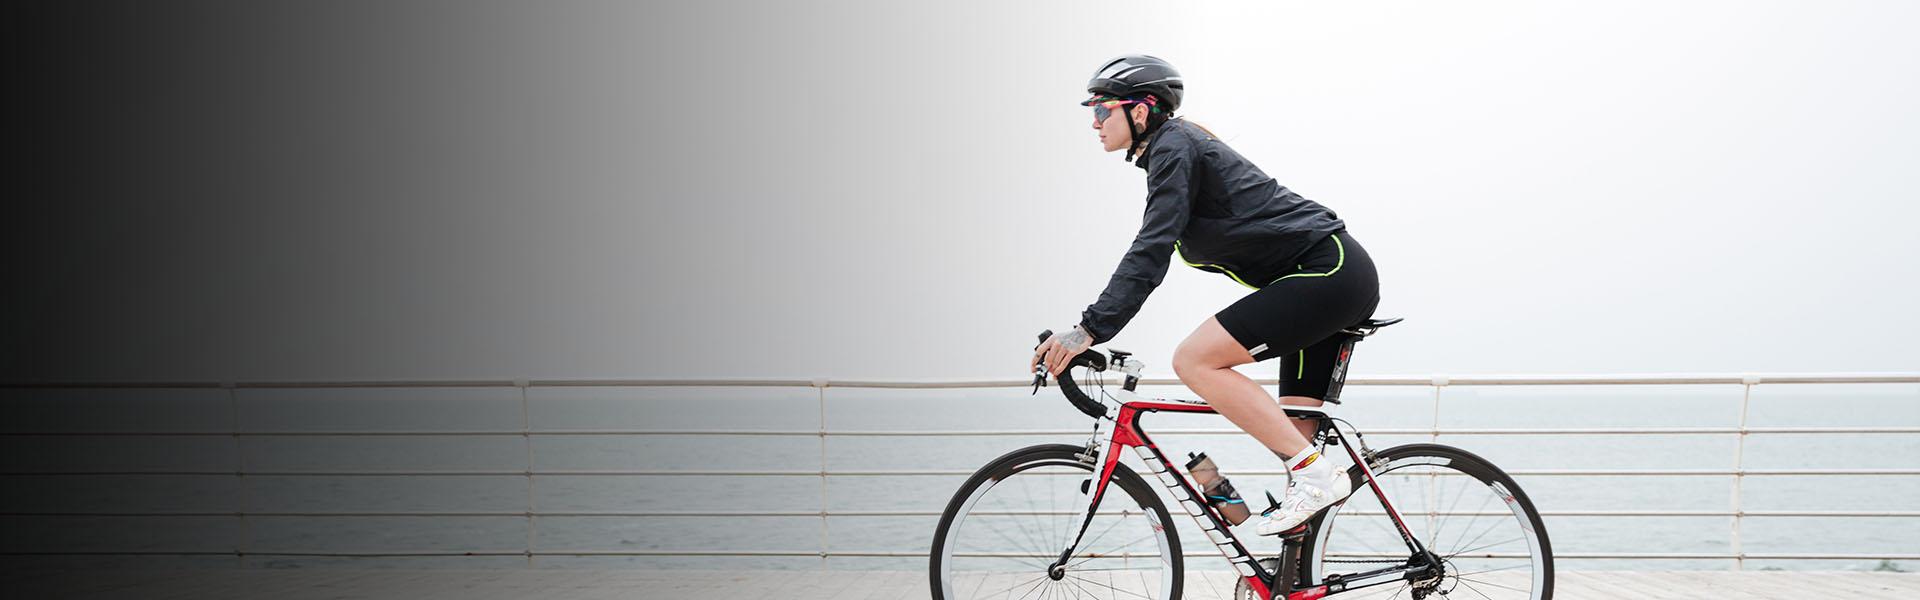 Best Cycling Paths in UAE